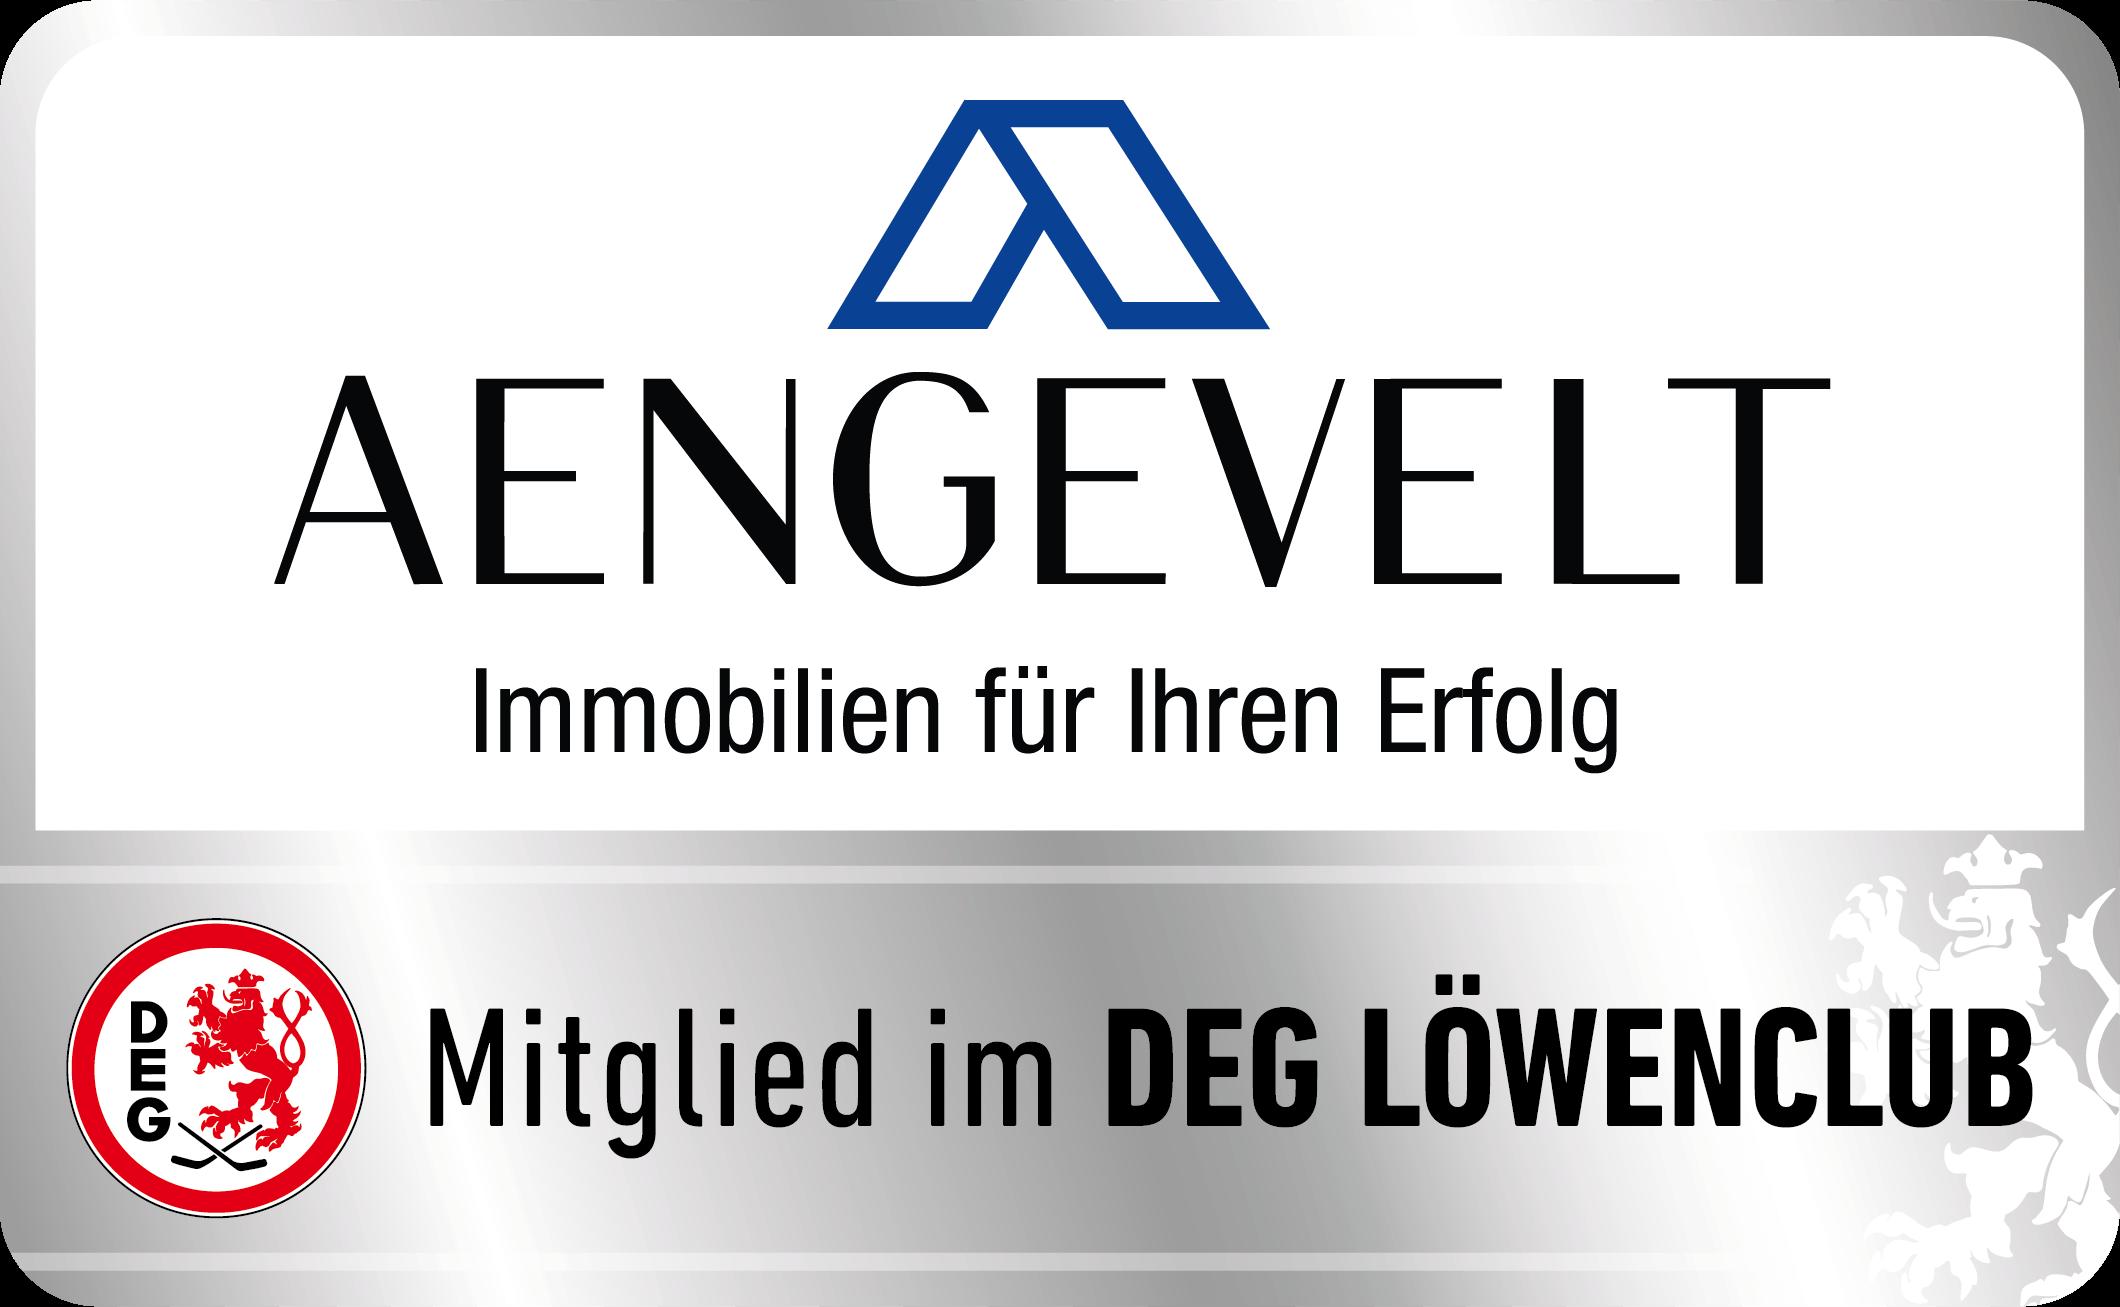 https://www.aengevelt.com/startseite.html